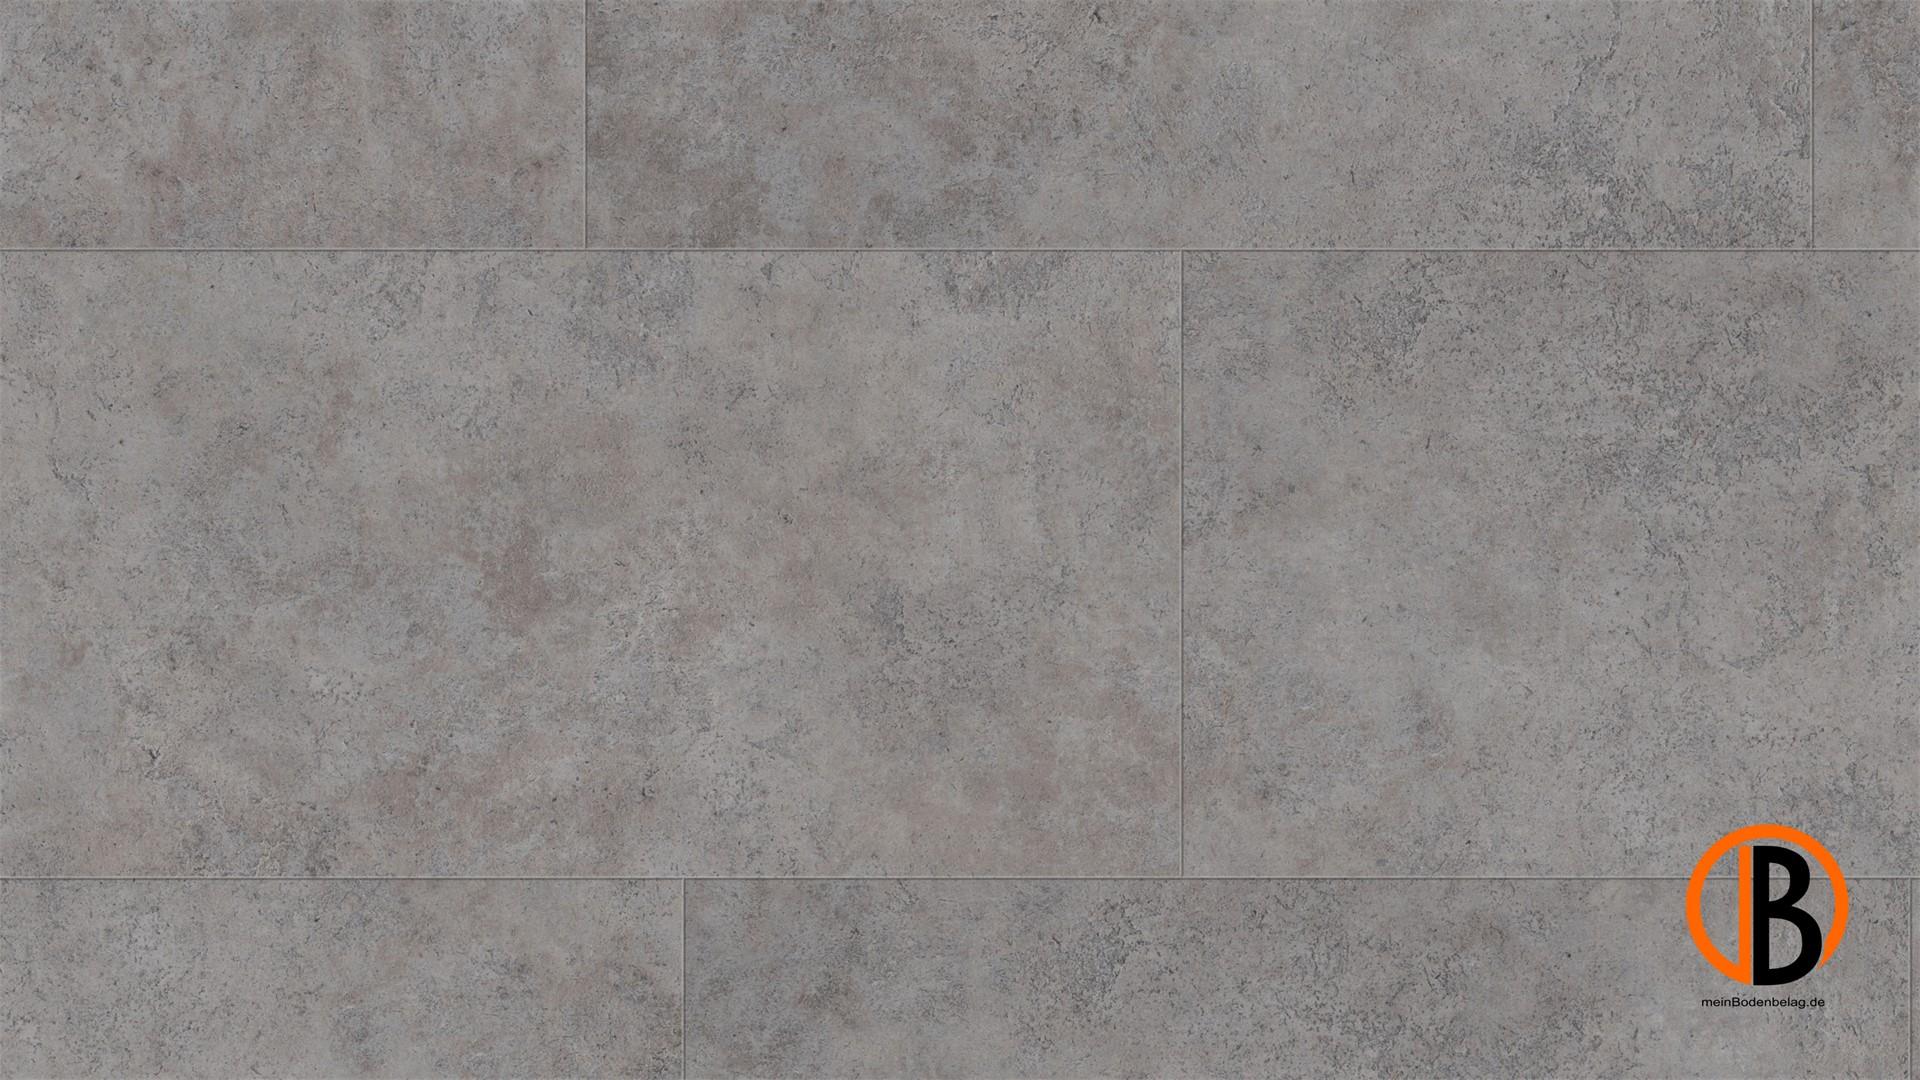 CINQUE GERFLOR VINYL SENSO LOCK 20 3.4/0.2   10000630;0   Bild 1